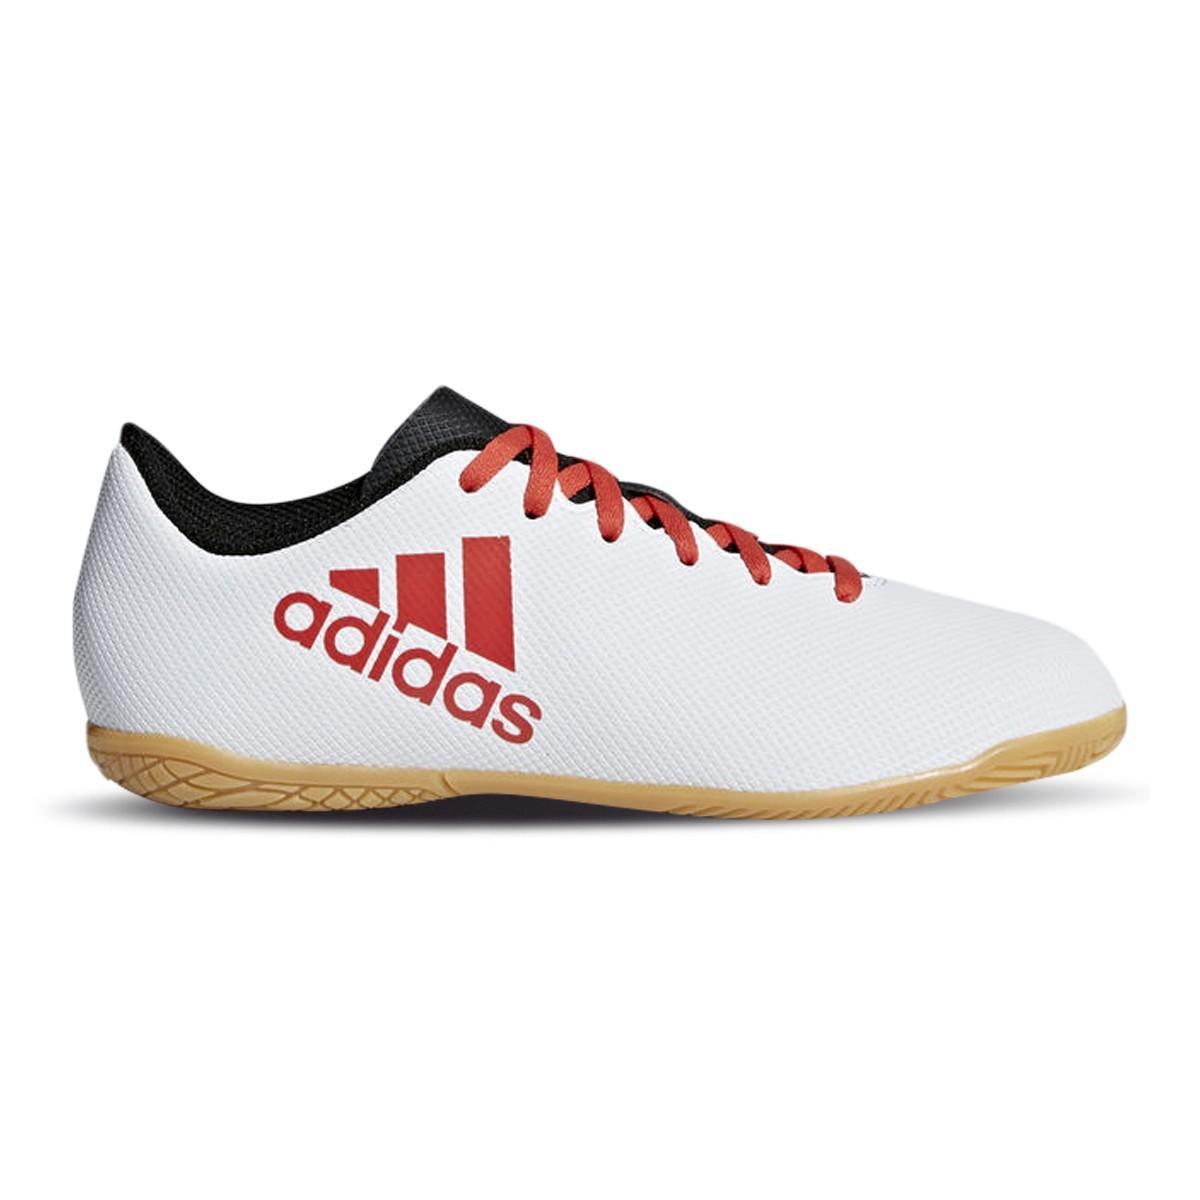 a6d500f2fd Chuteira Futsal Infantil Adidas X 17.4 IN - Compre Agora